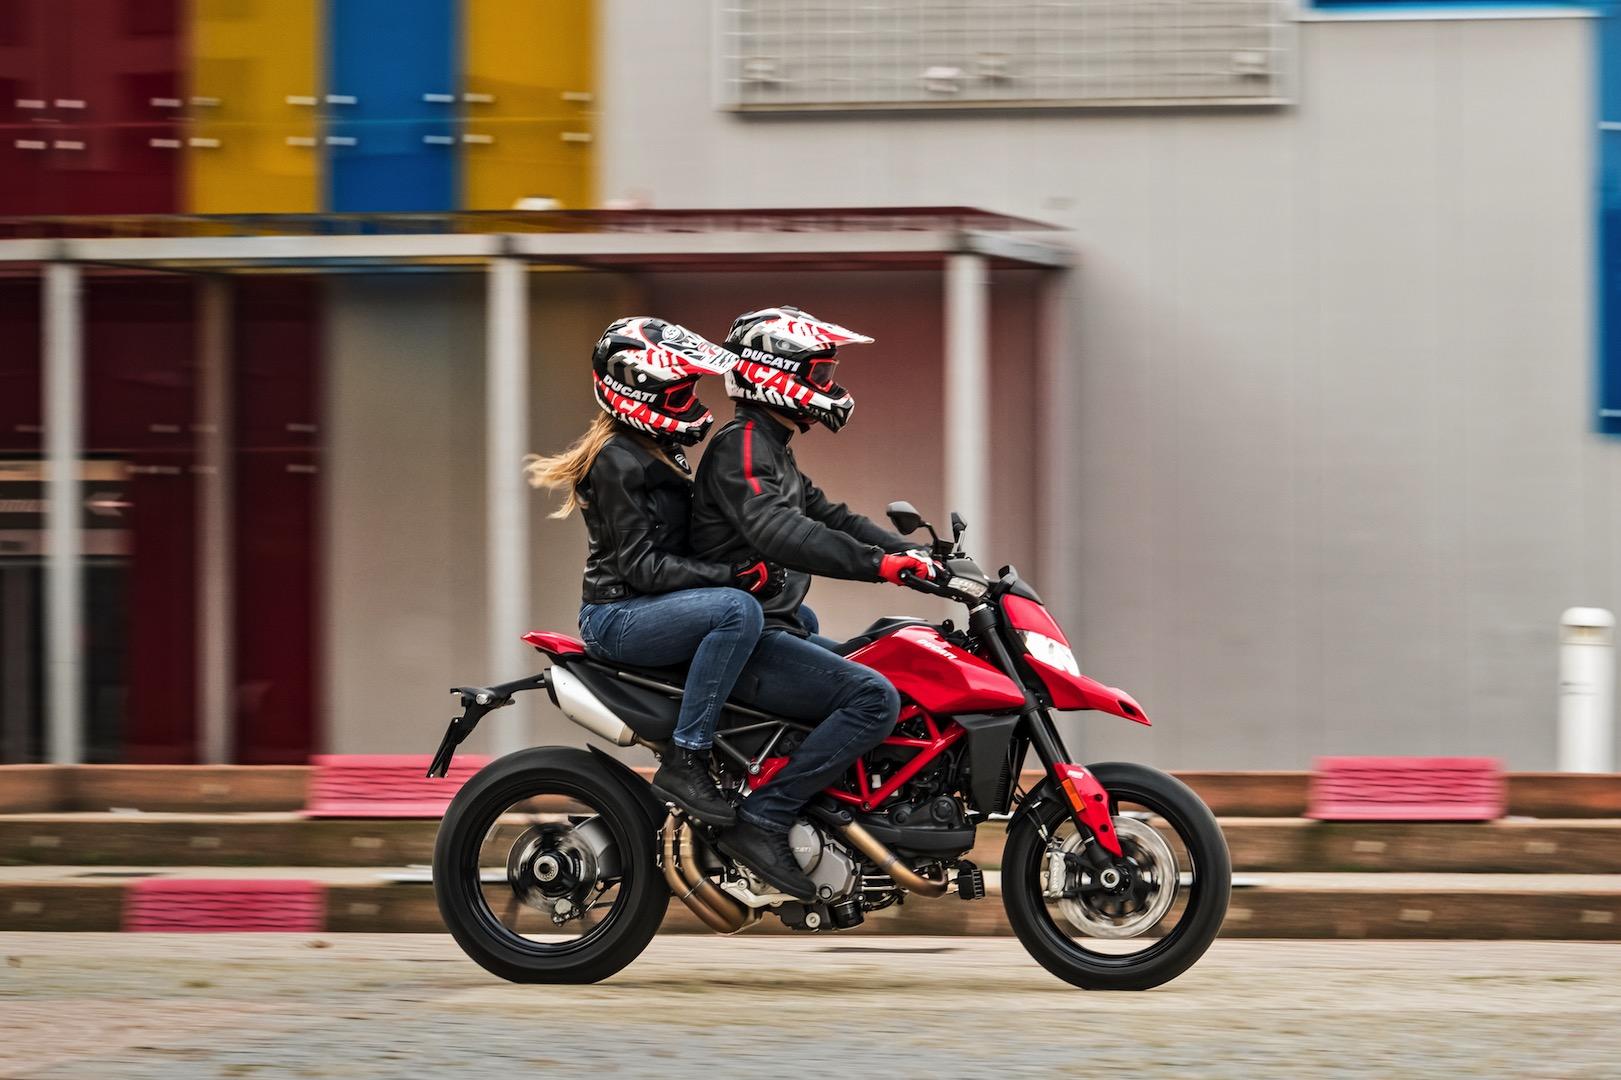 2019 Ducati Hypermotard 950 base